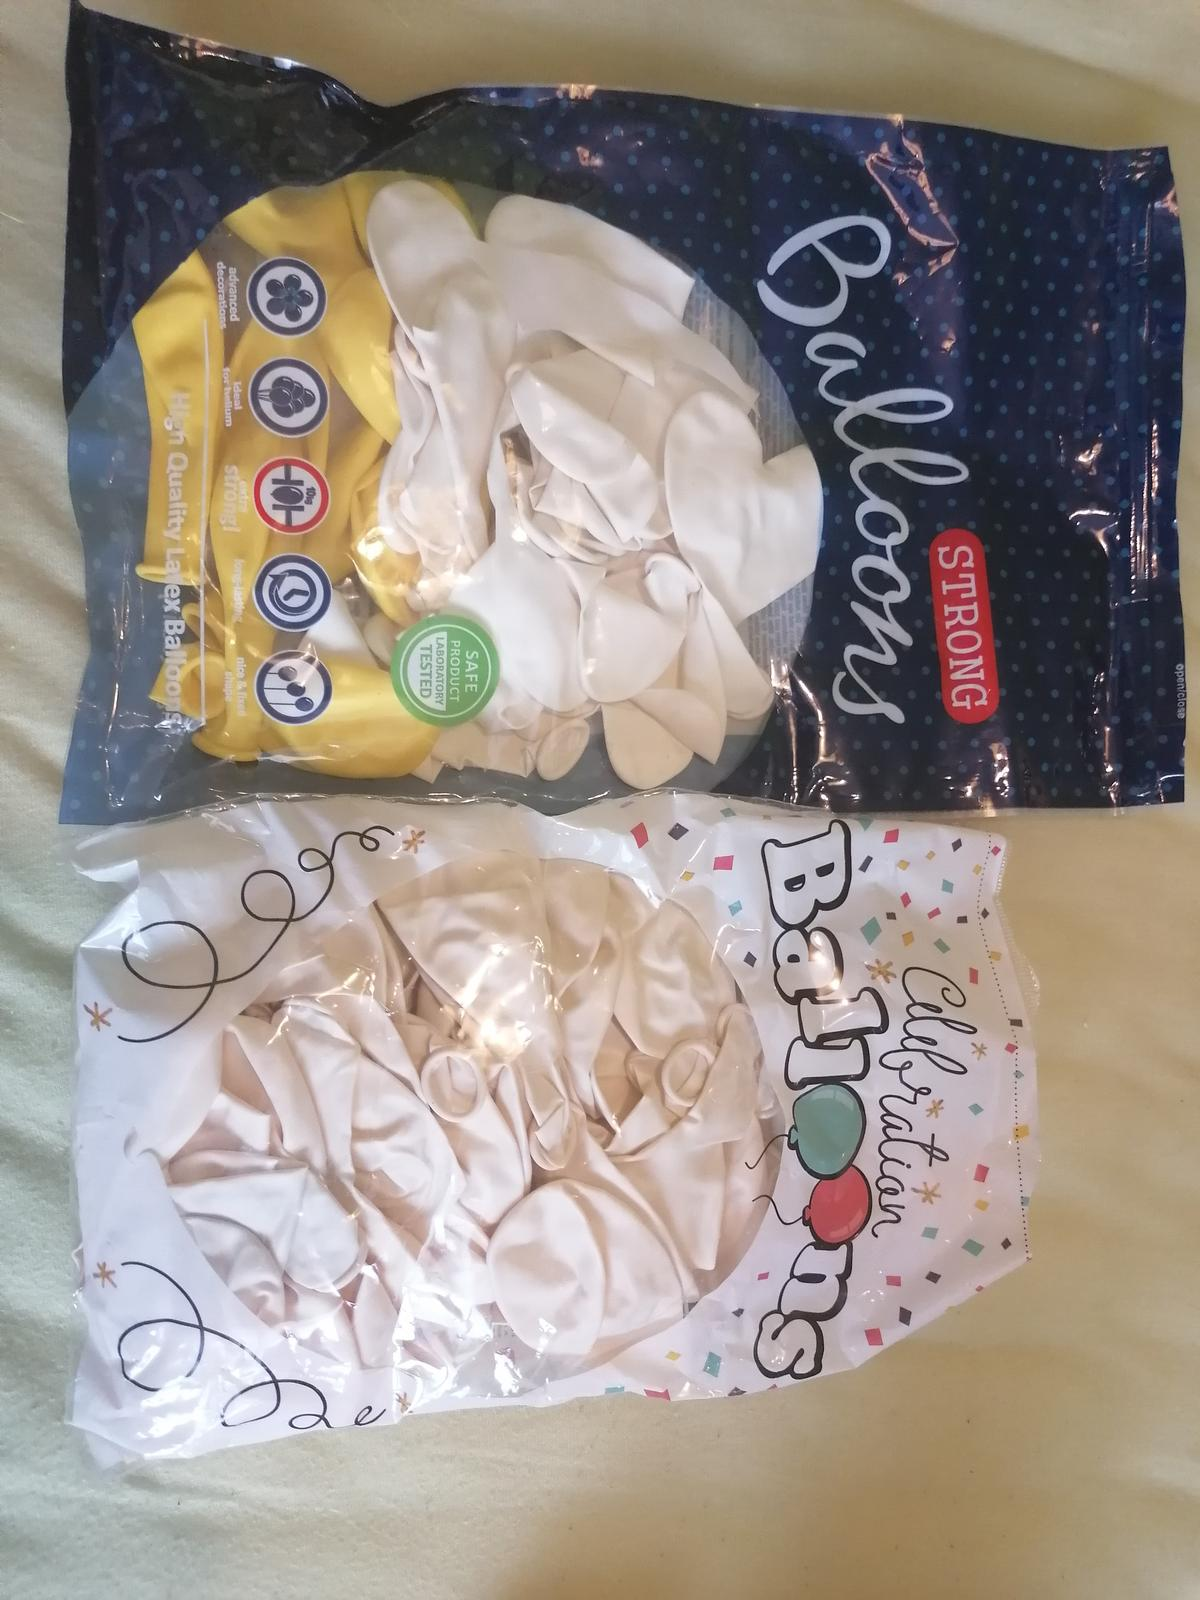 Bíložluté balónky a bublifuky - Obrázek č. 2